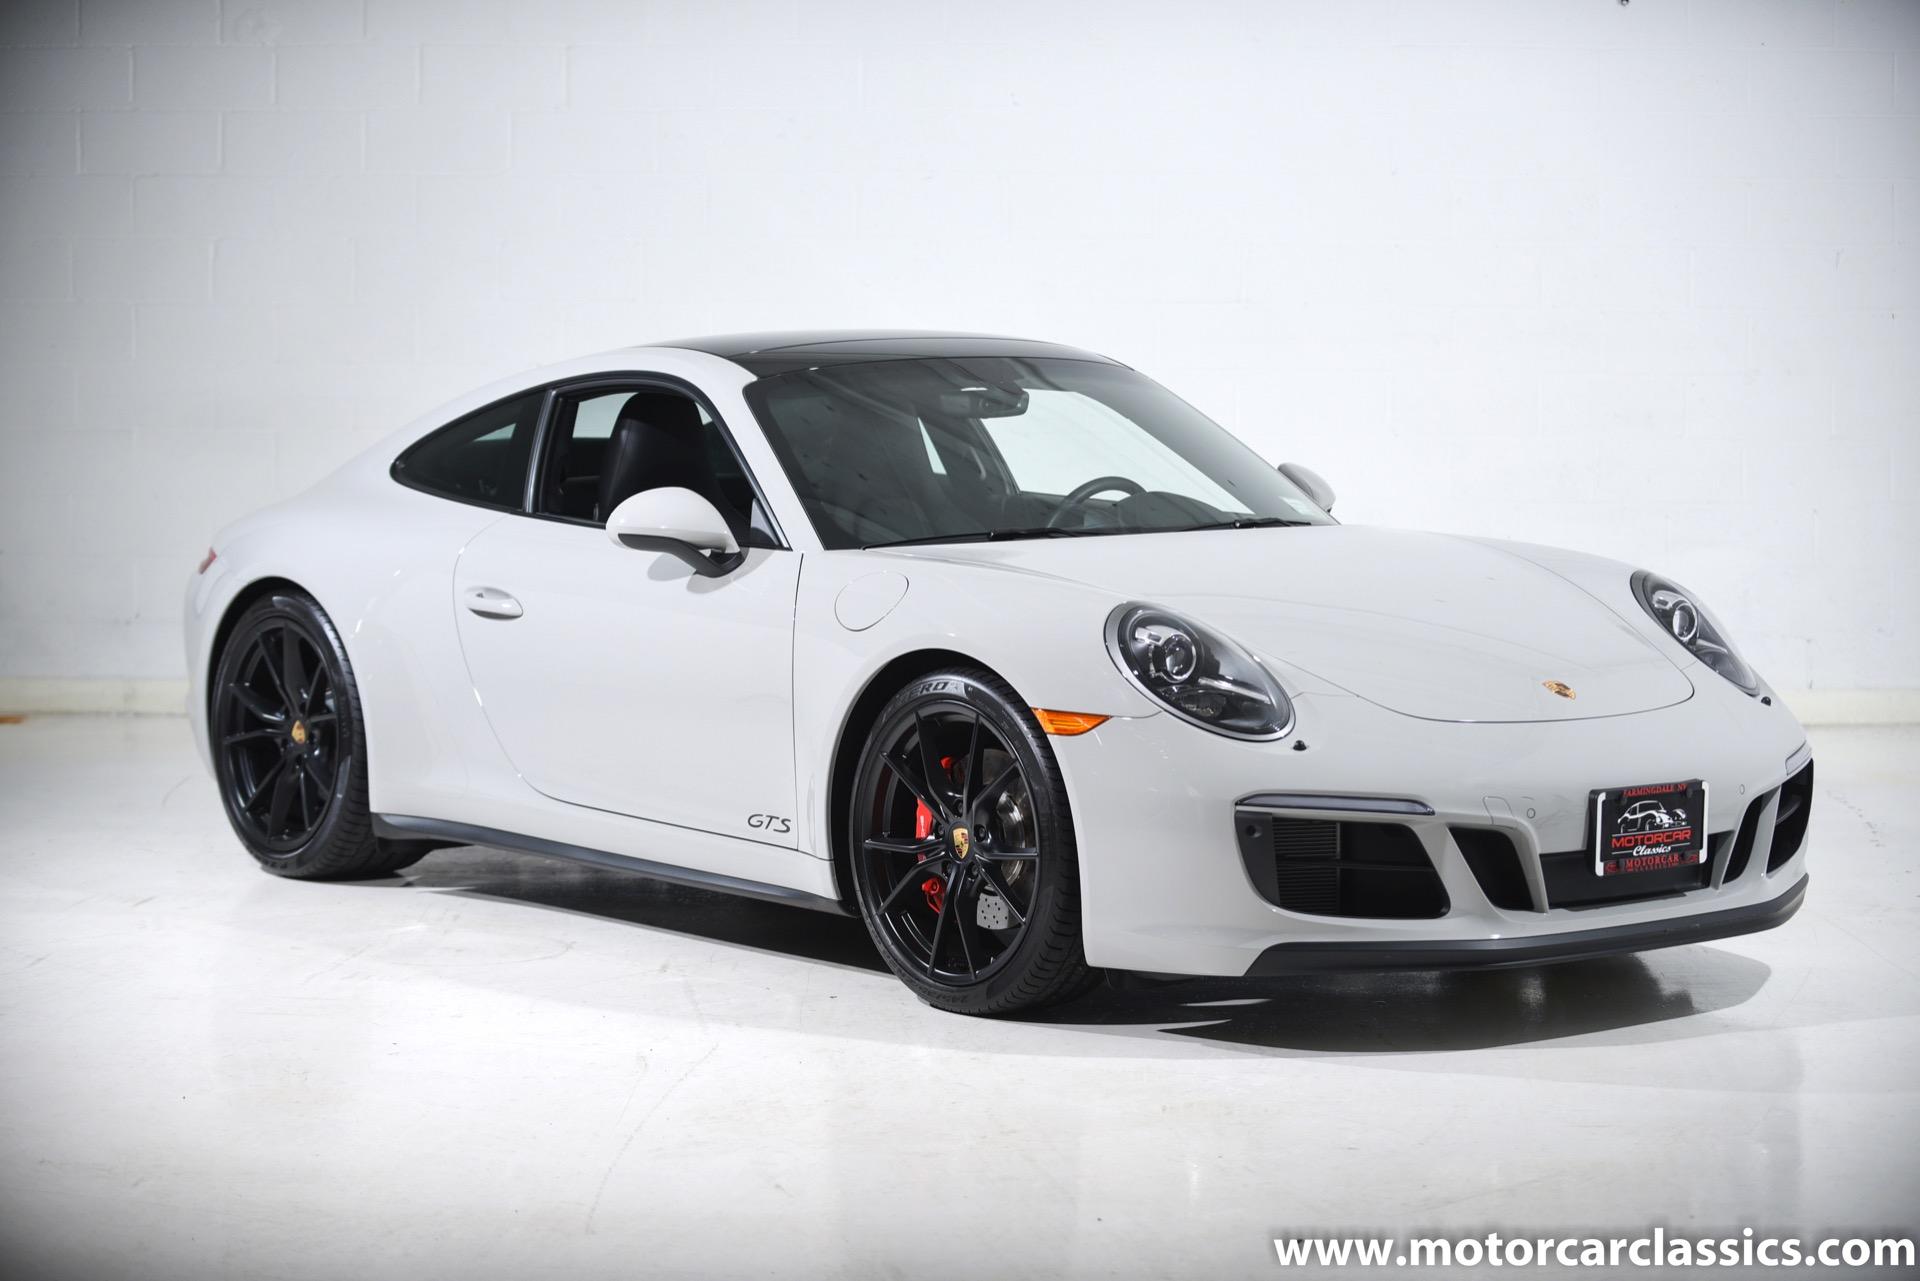 Used 2018 Porsche 911 Carrera 4 Gts For Sale 124 900 Motorcar Classics Stock 1440